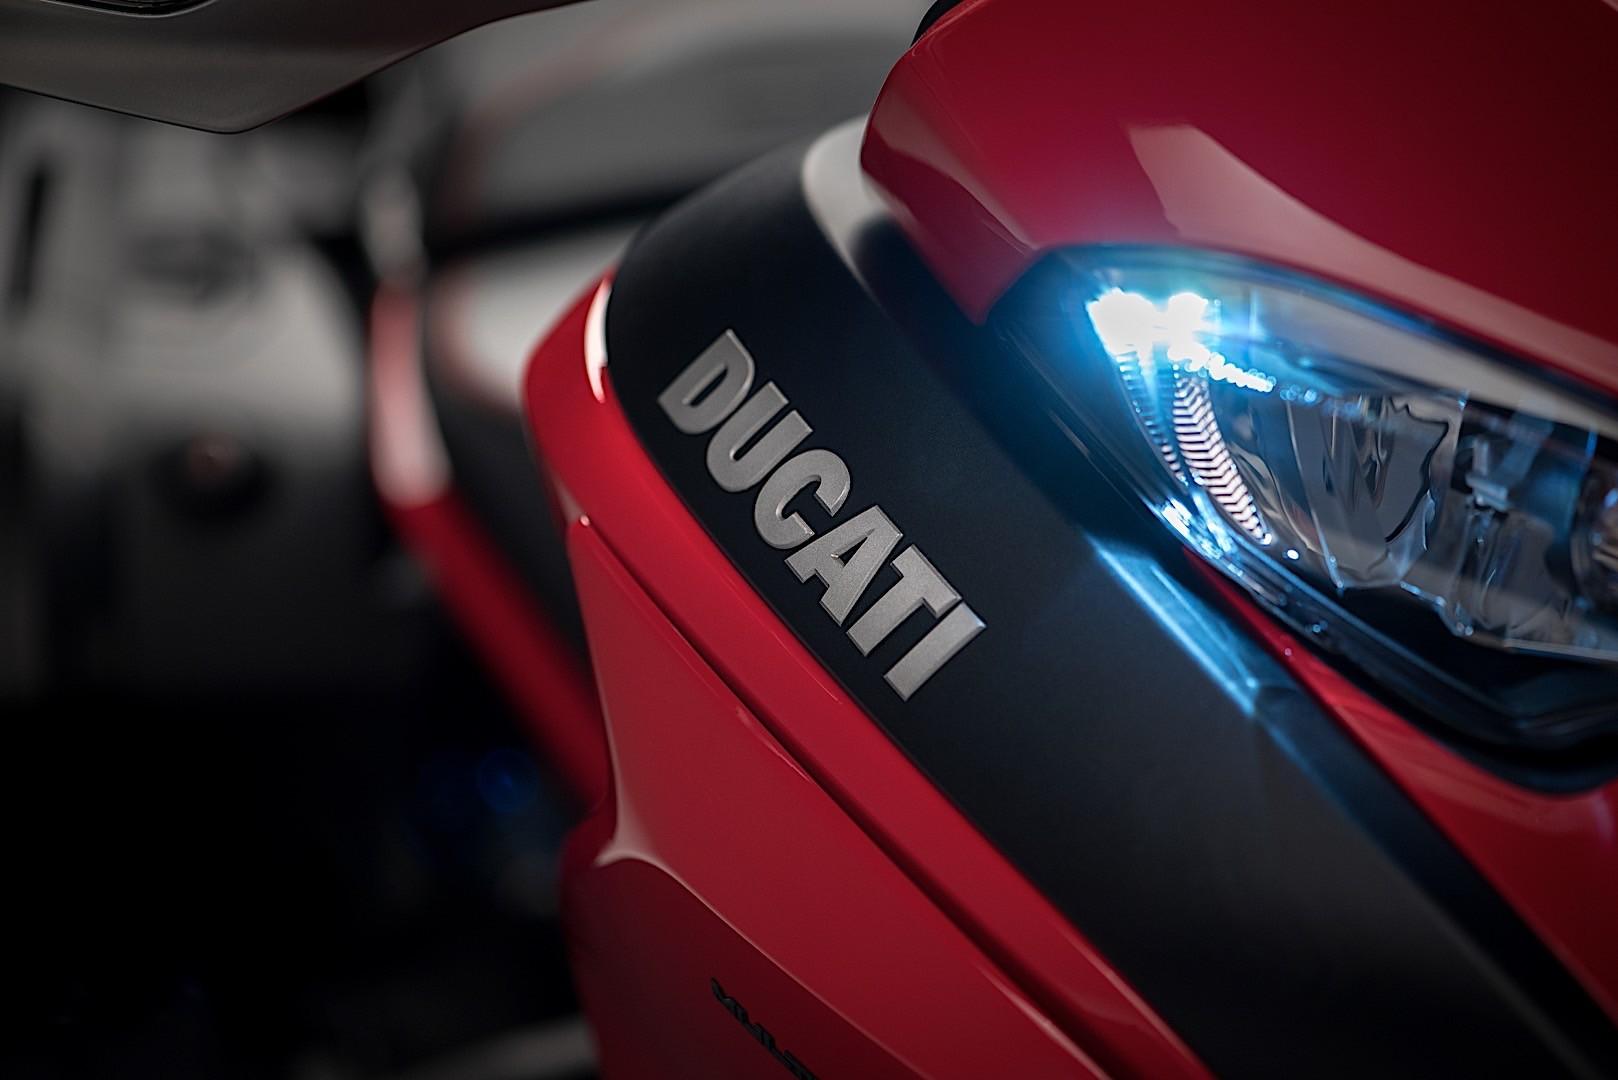 2018 Ducati Multistrada Adventure Bike To Get Bigger Engine